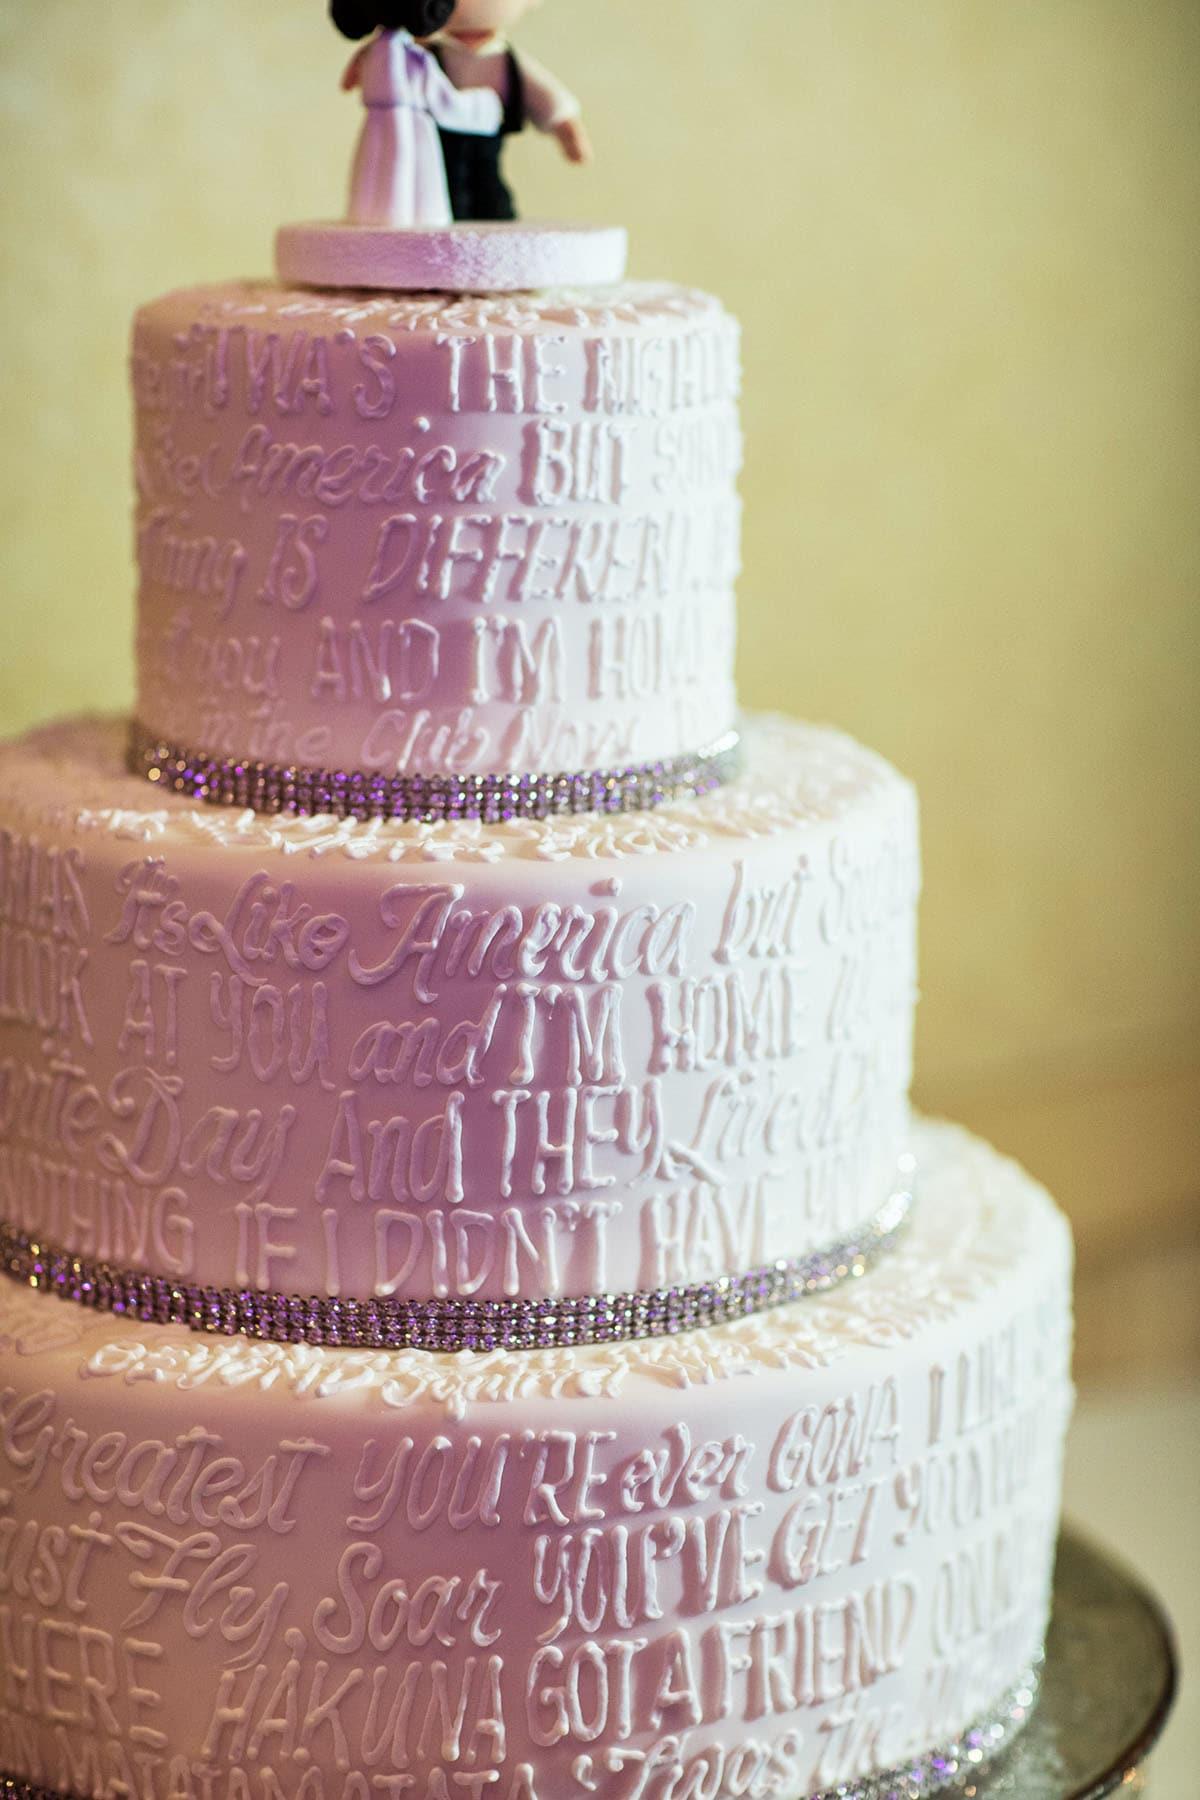 Disney Wedding Quotes Wedding Cake Wednesday Disney Movie Quotes  Disney Weddings